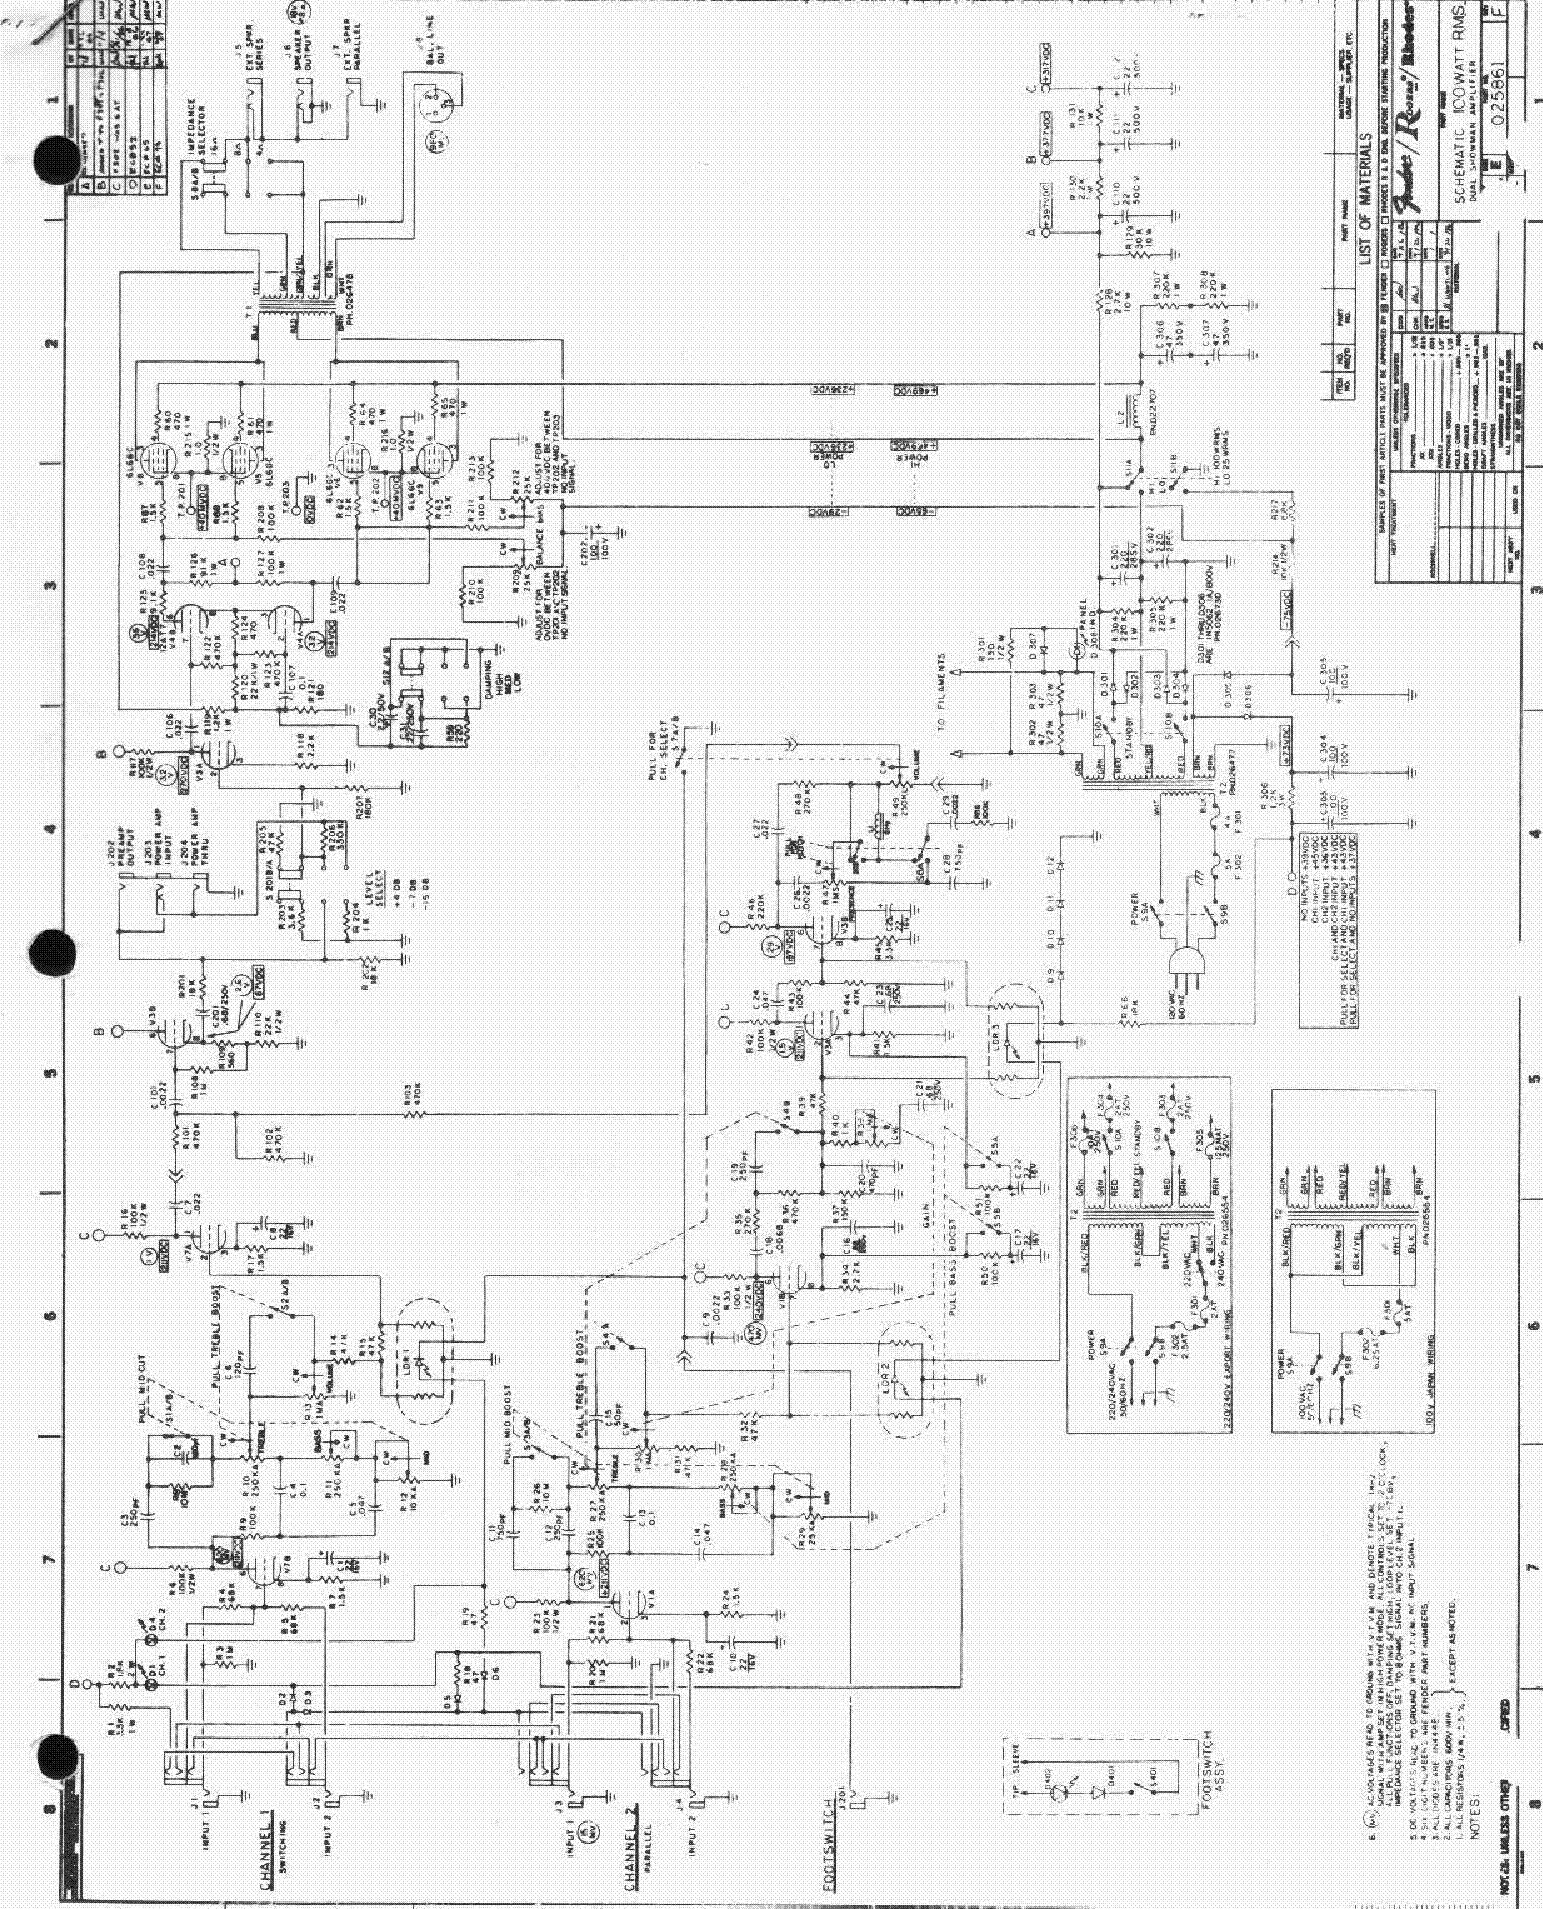 fender acoustasonic sfx ii guitar amplifier sch service